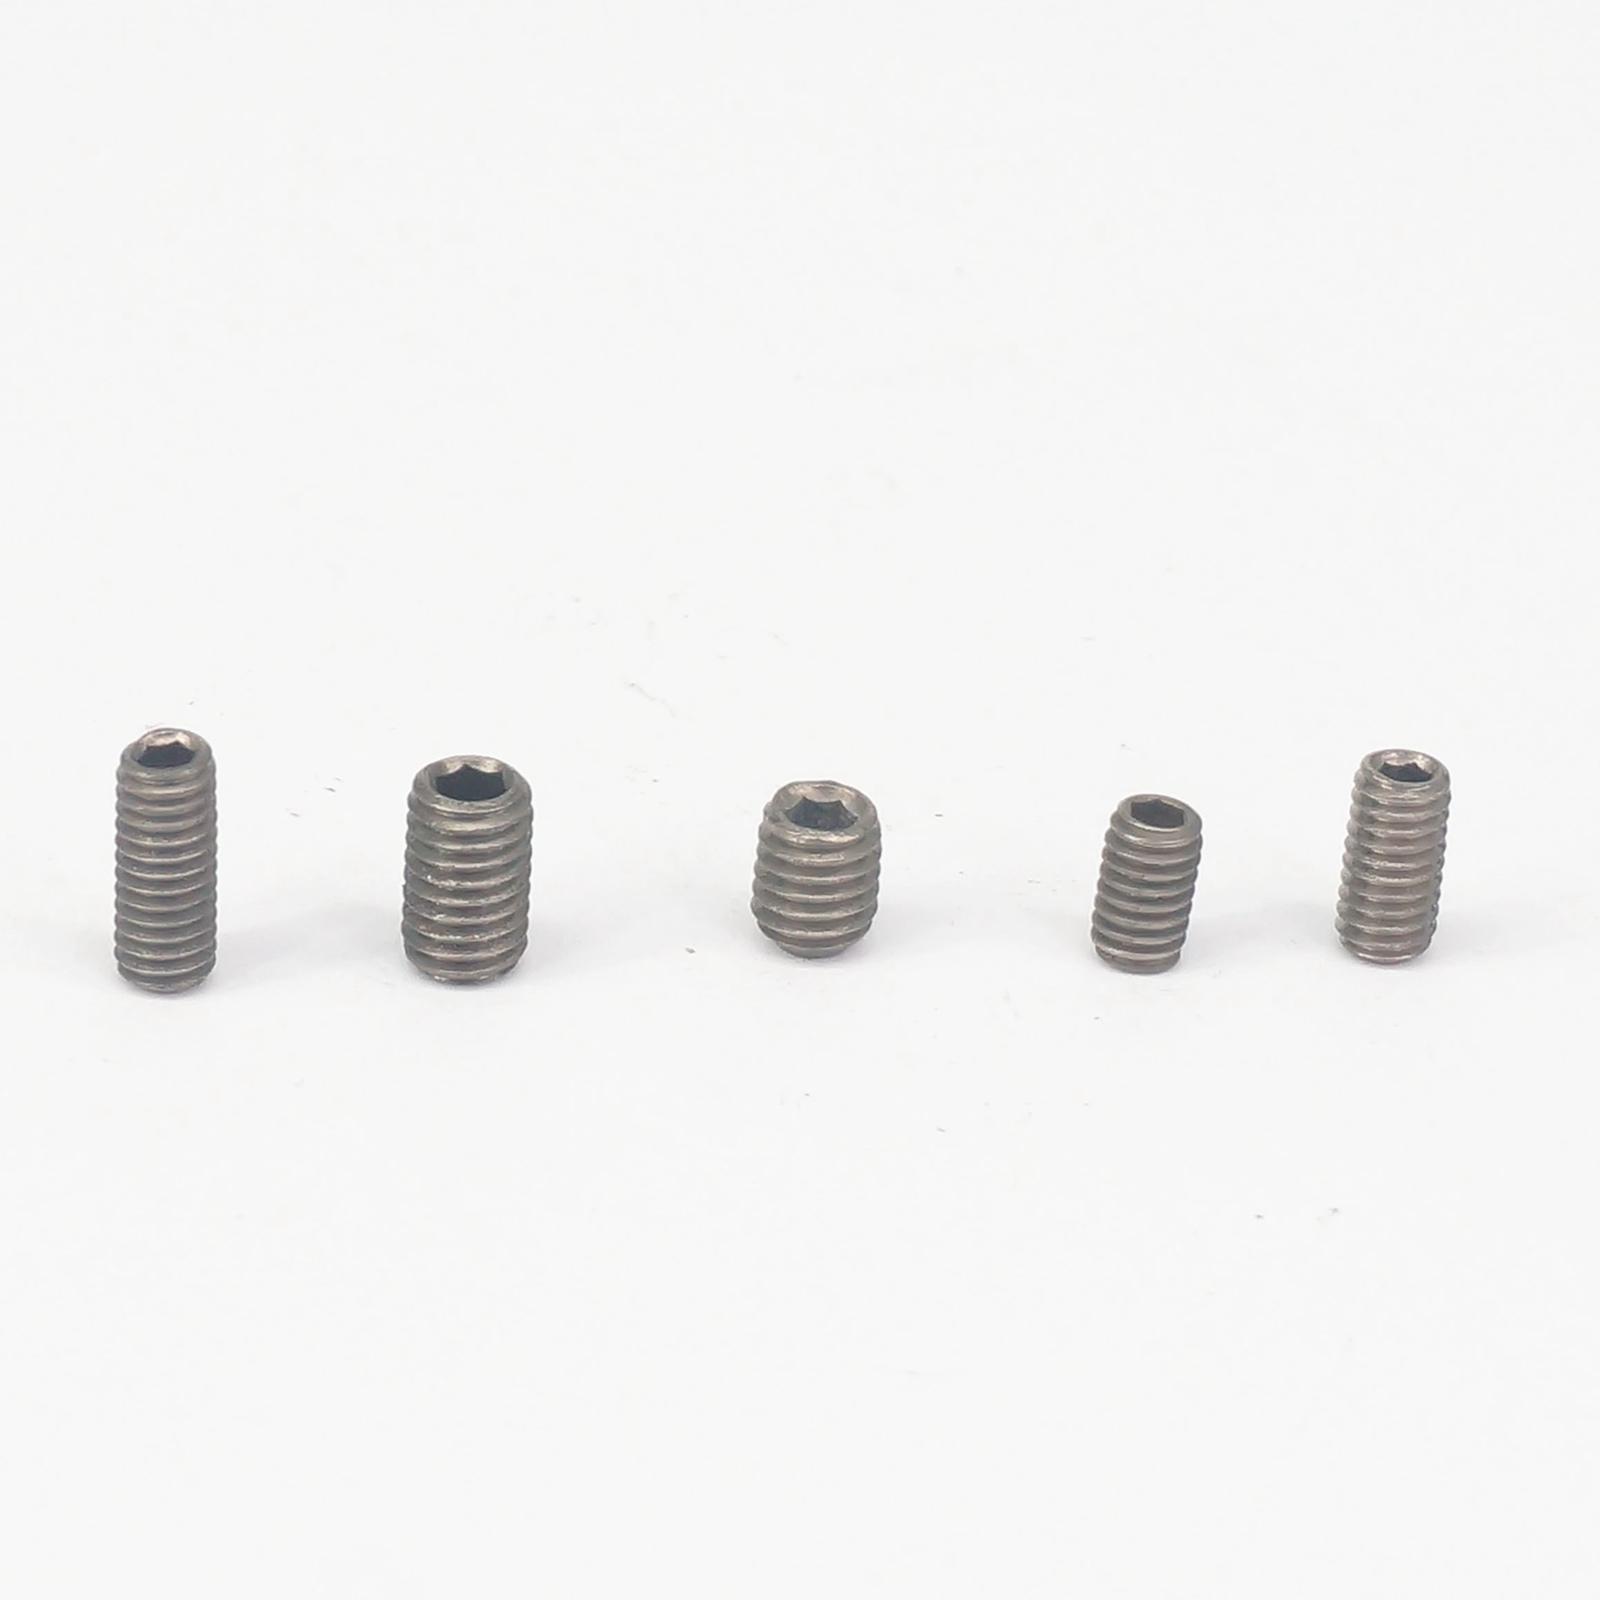 Set Grub Screw Silver Tone 25 Pcs Uxcell a16012900ux0678 Grub Screw M5 x 6Mm Hex Socket Cone Pt